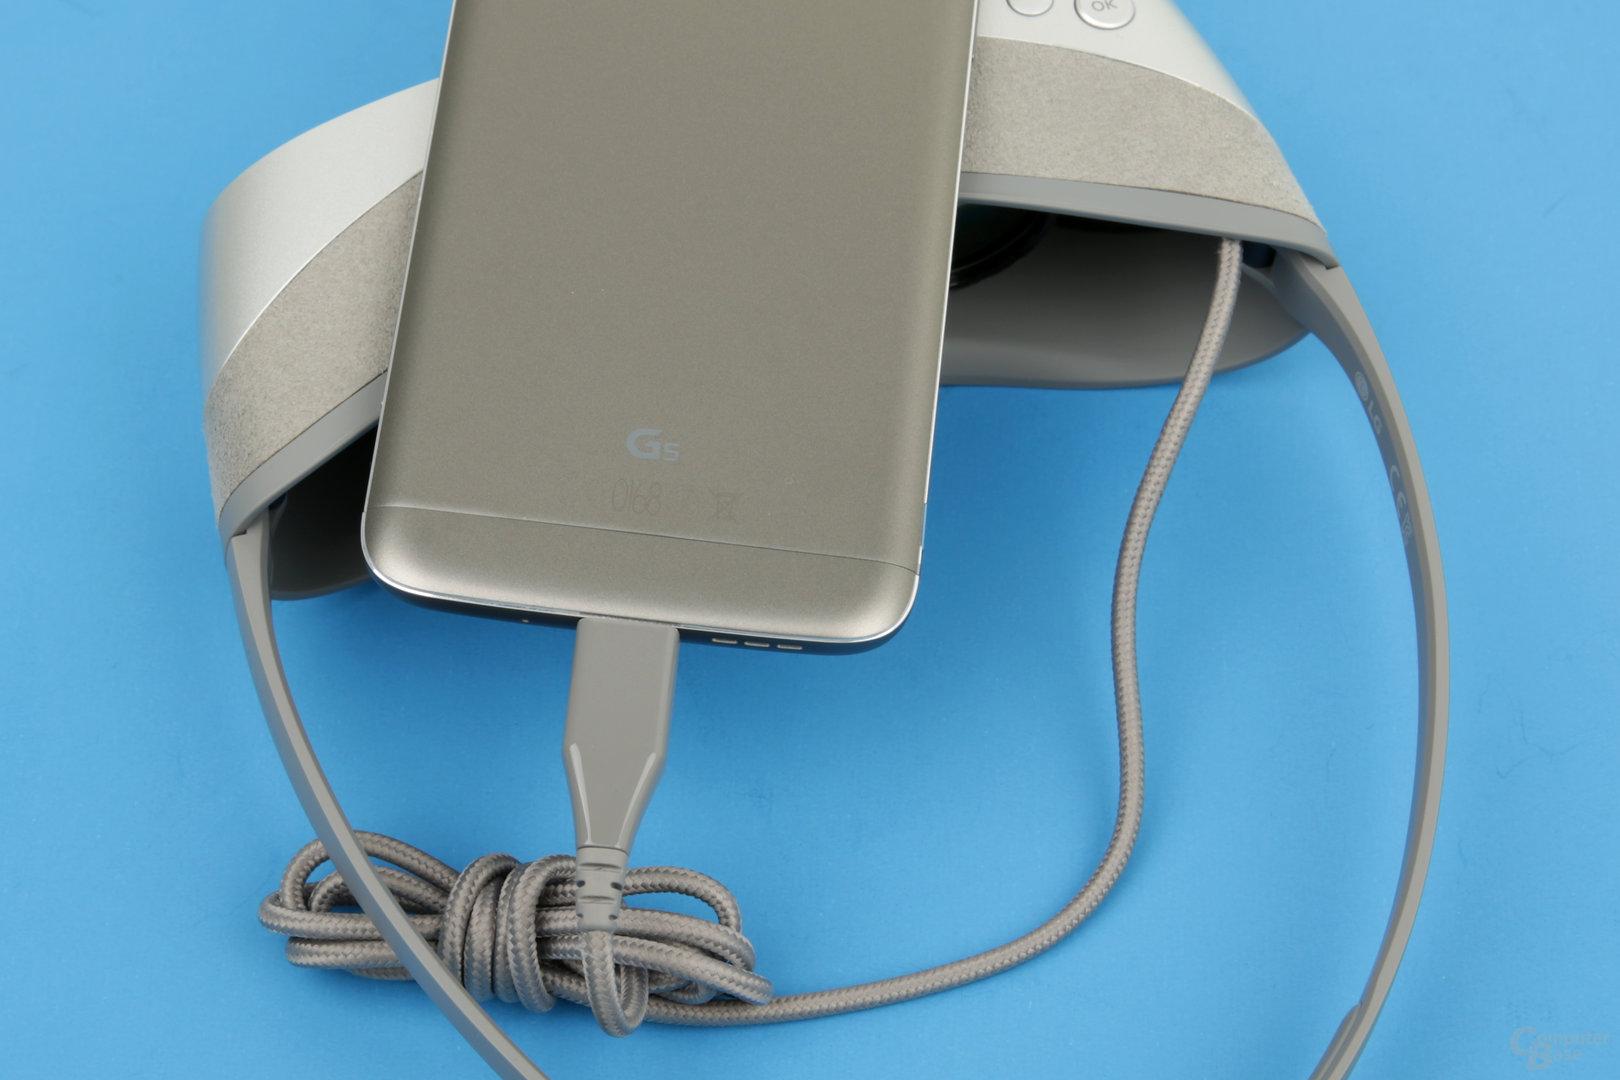 Verbindung per USB-Kabel mit 1 Meter Länge